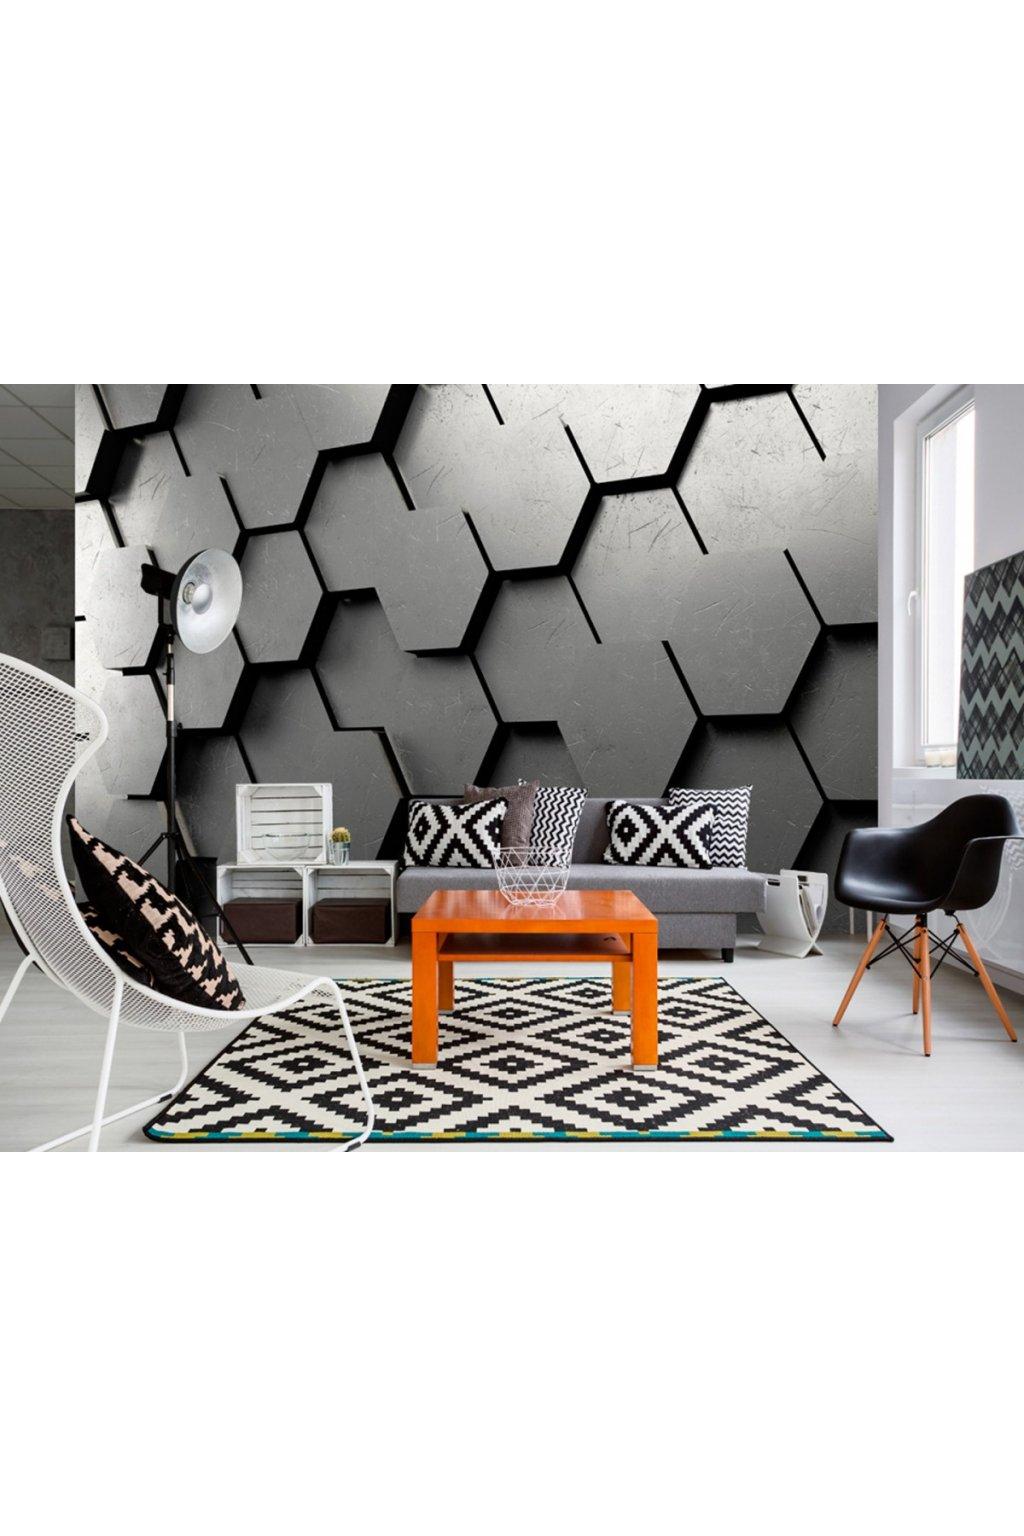 Murando DeLuxe Tapeta - 3D šedé plástve  - zvìtšit obrázek